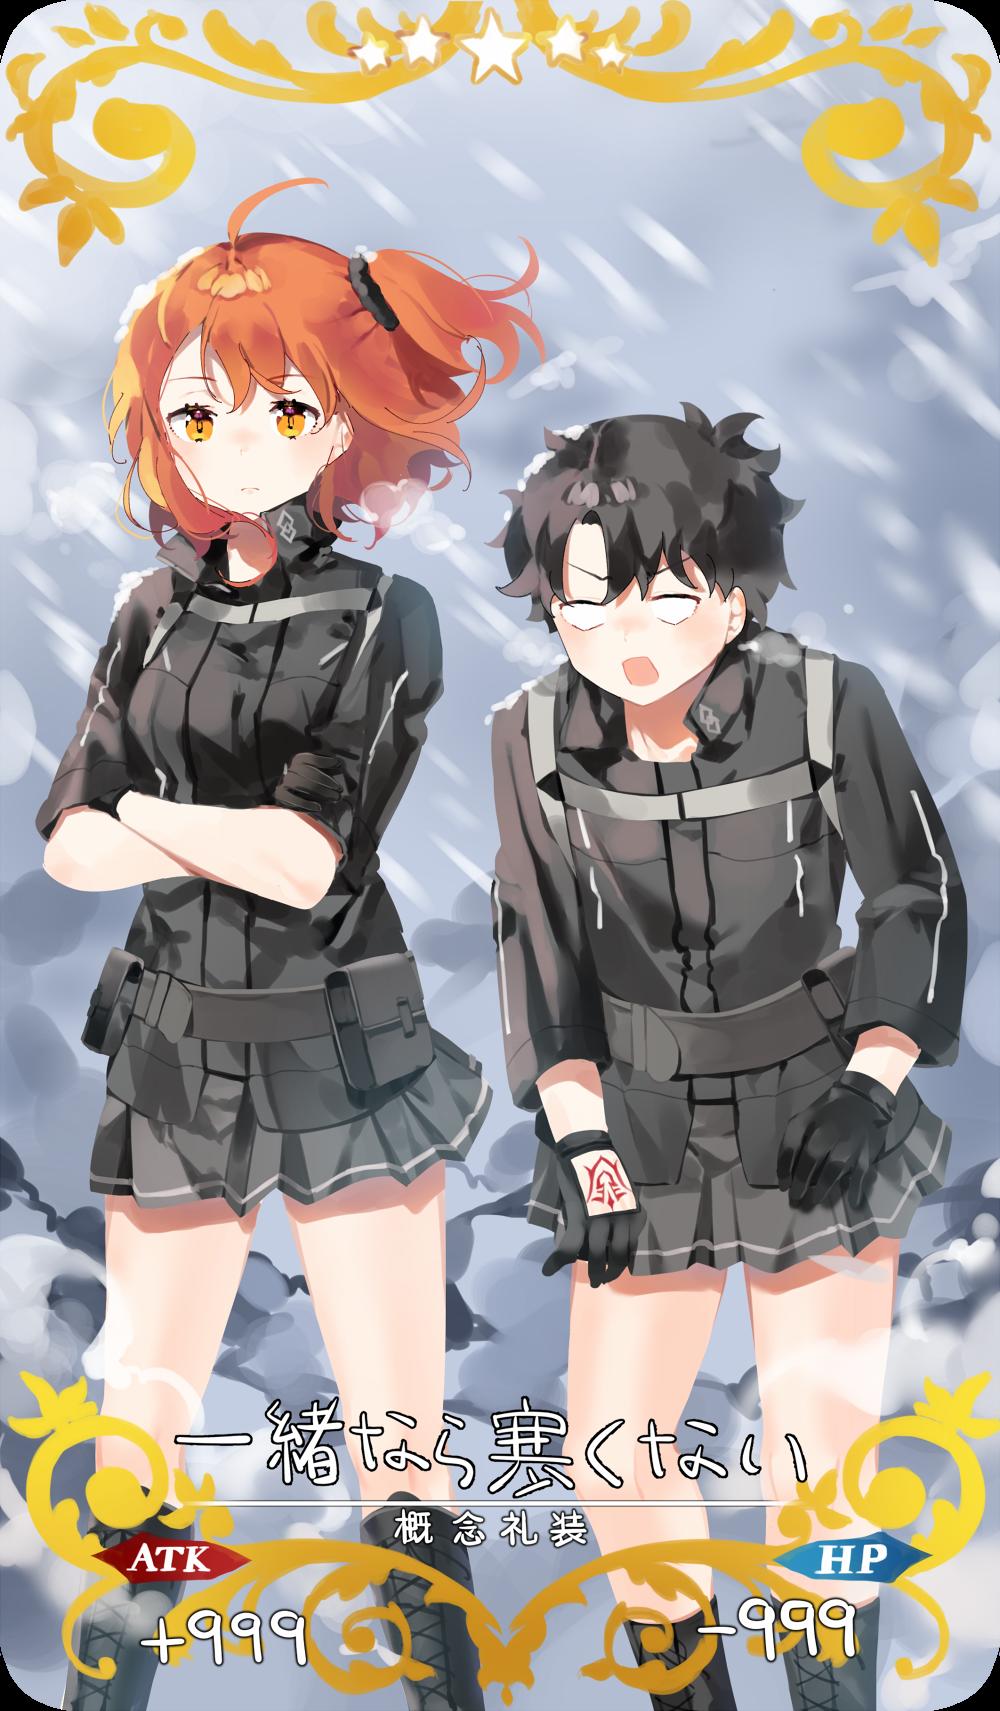 Gudako Gudao Fate Anime funny, Anime, Fate